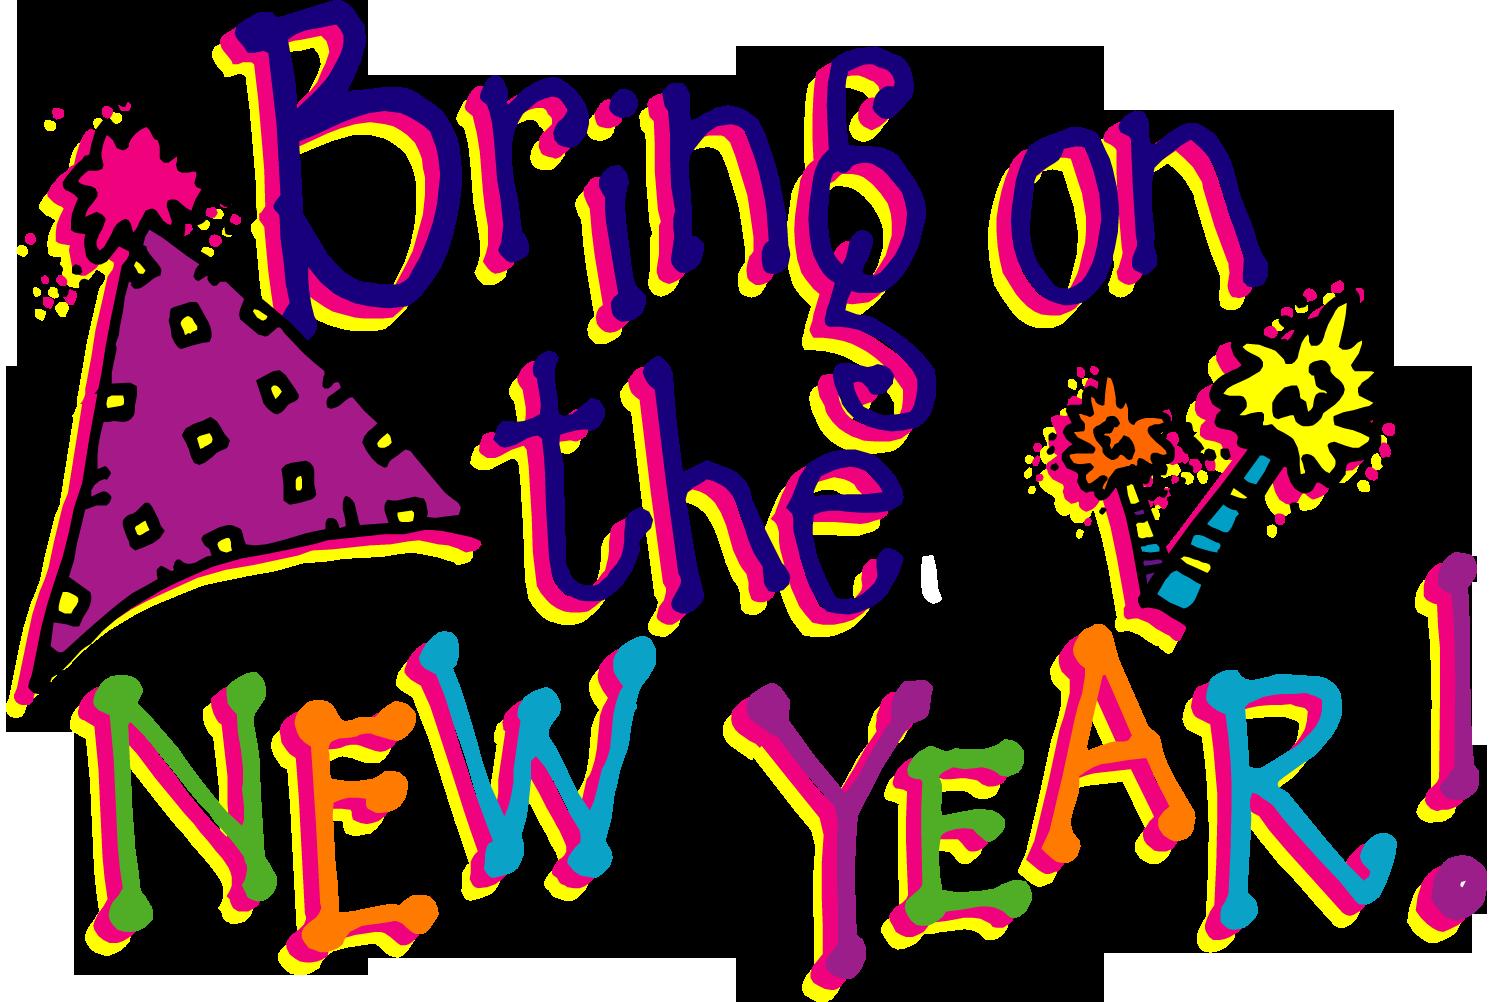 Happy New Year Clipart 6 .-Happy new year clipart 6 .-4